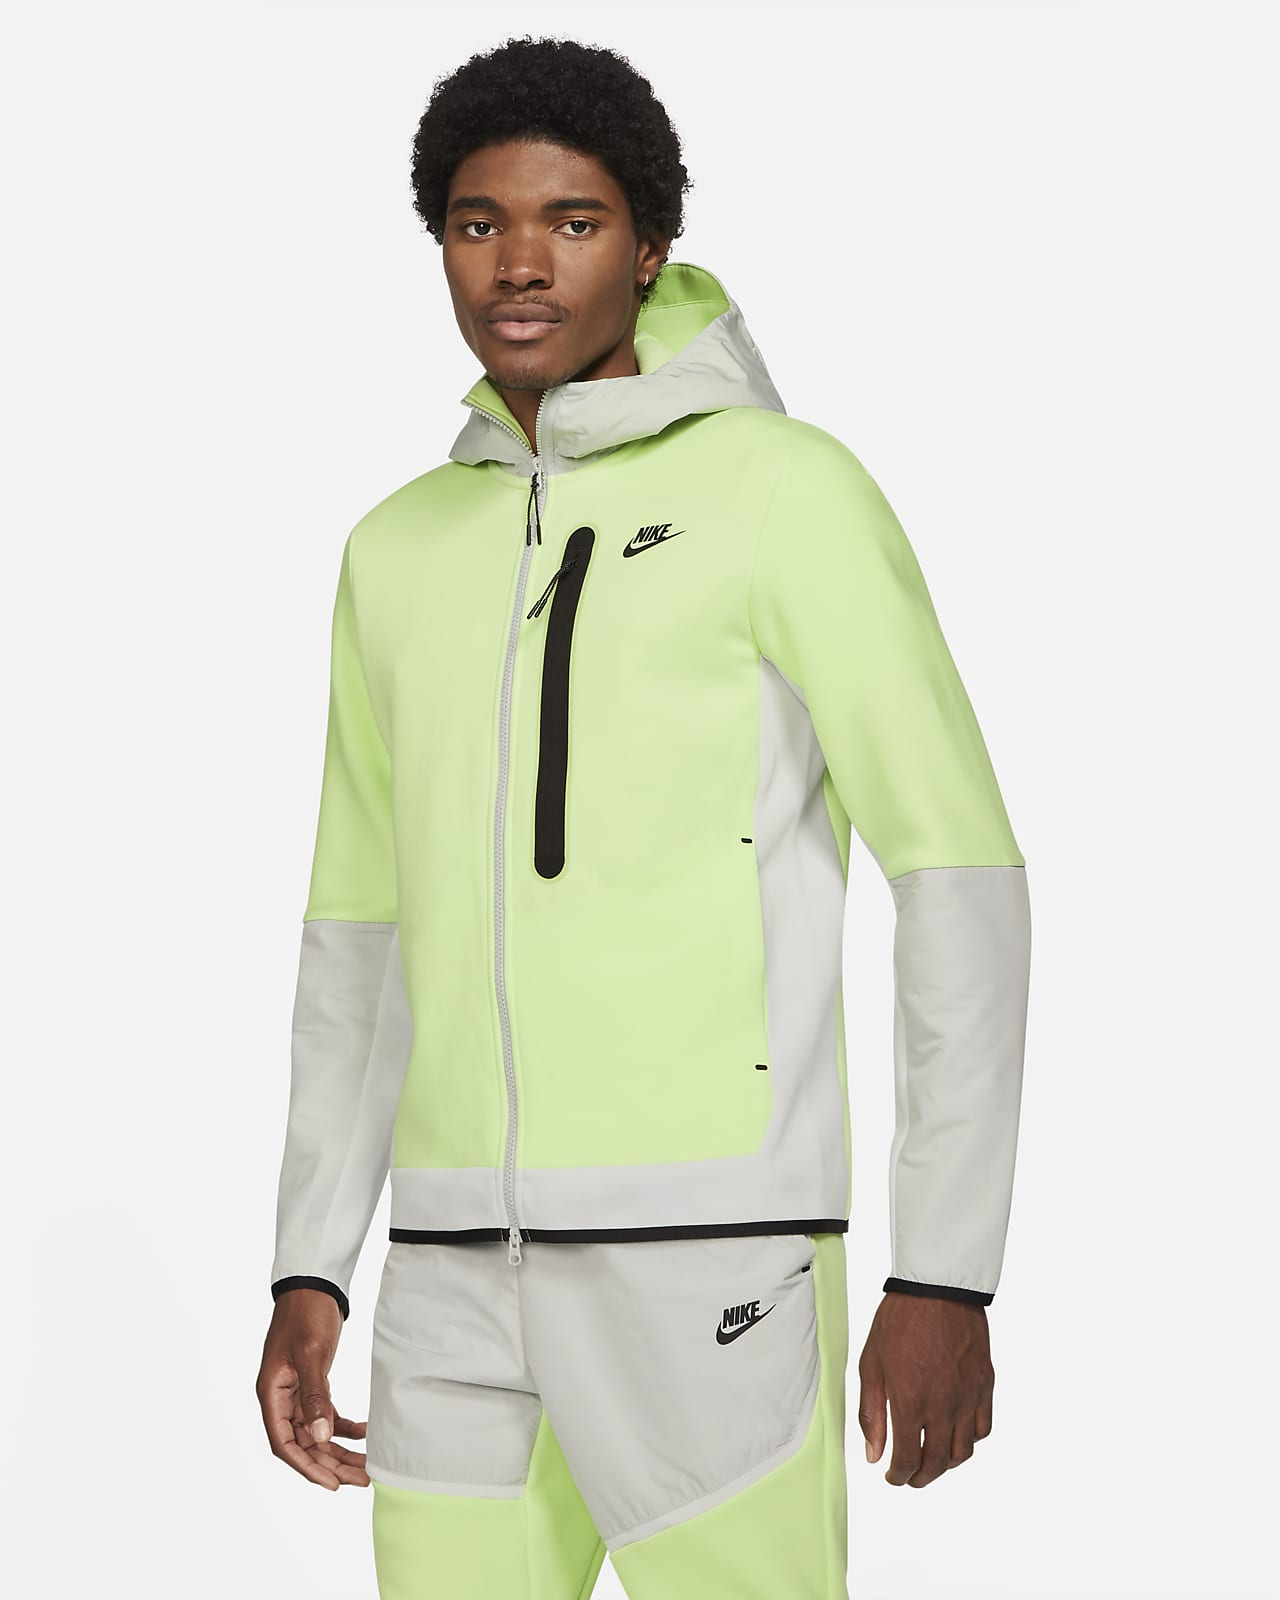 Nike Sportswear Tech Fleece Sudadera con capucha con cremallera completa de tejido Woven - Hombre